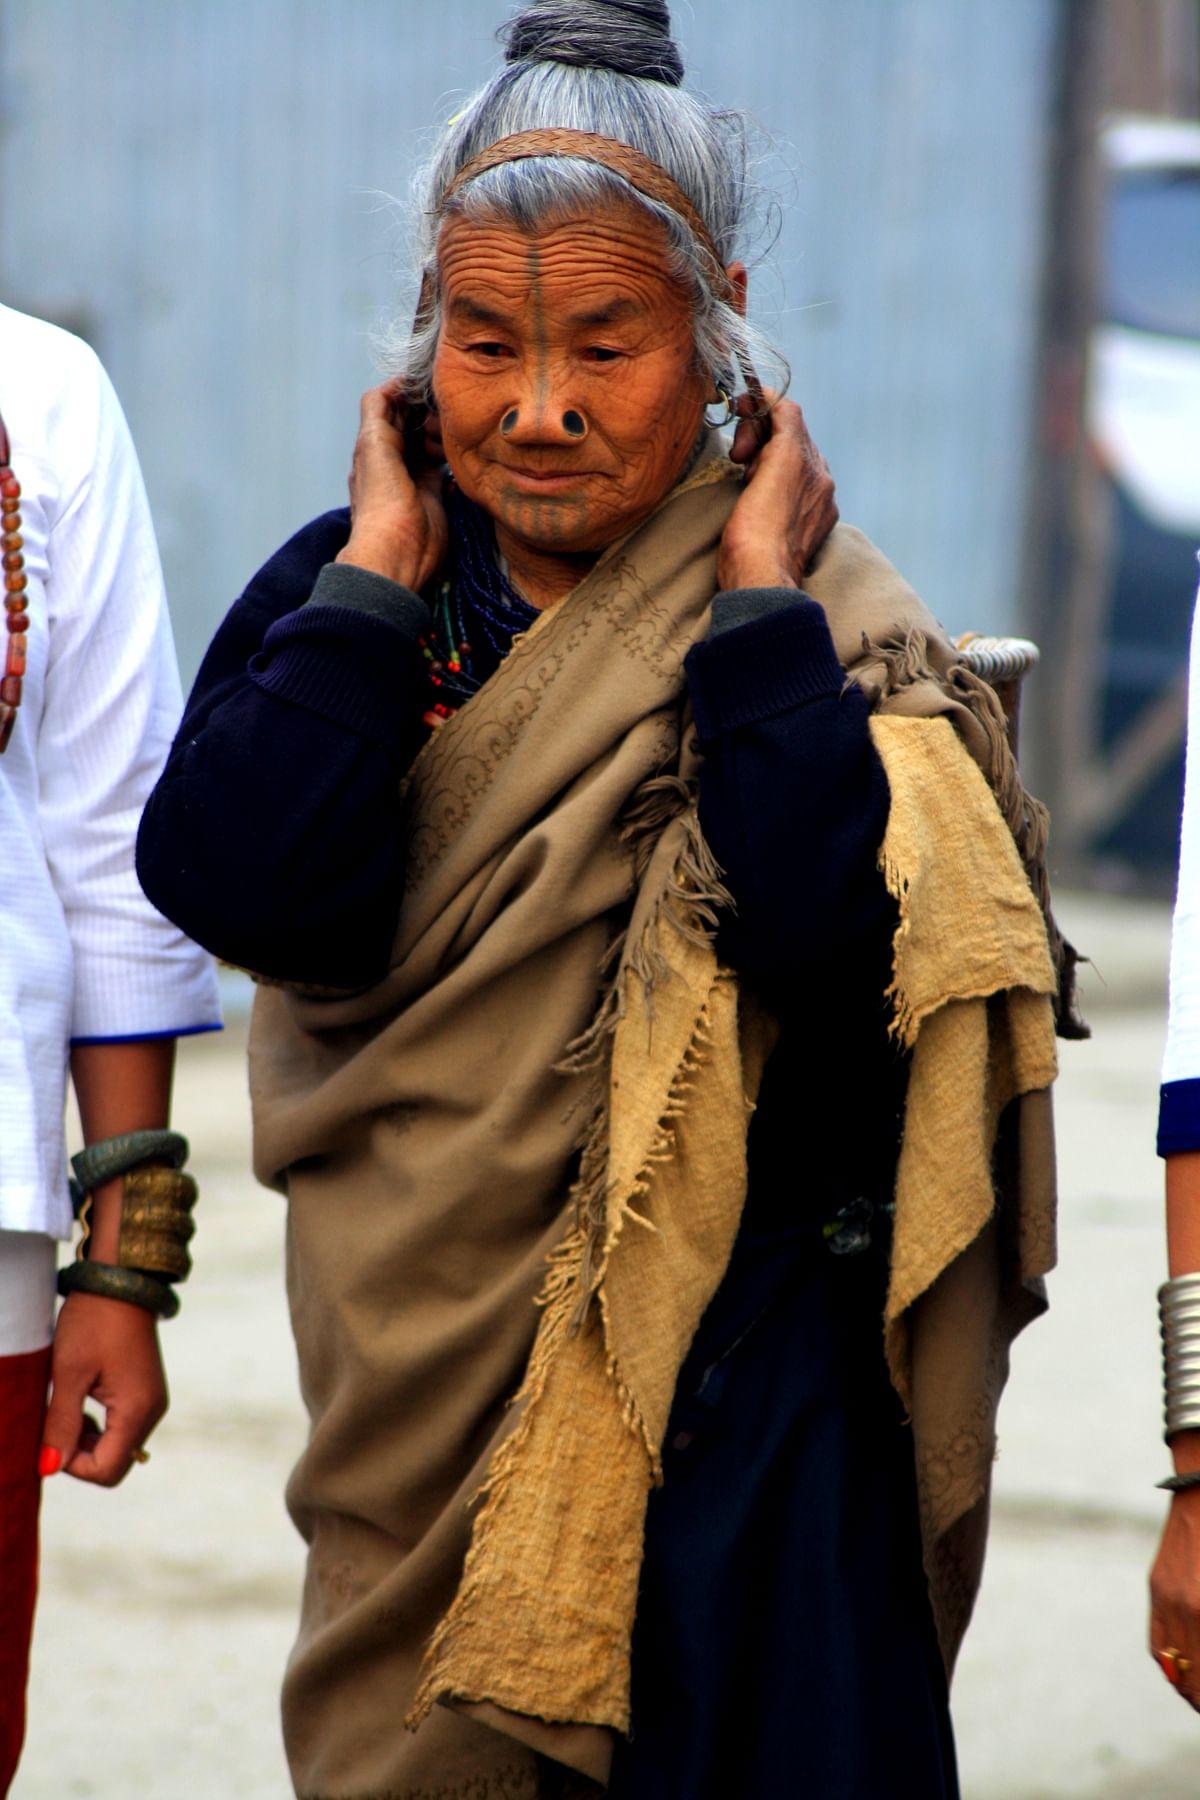 An old woman ready for Myoko.